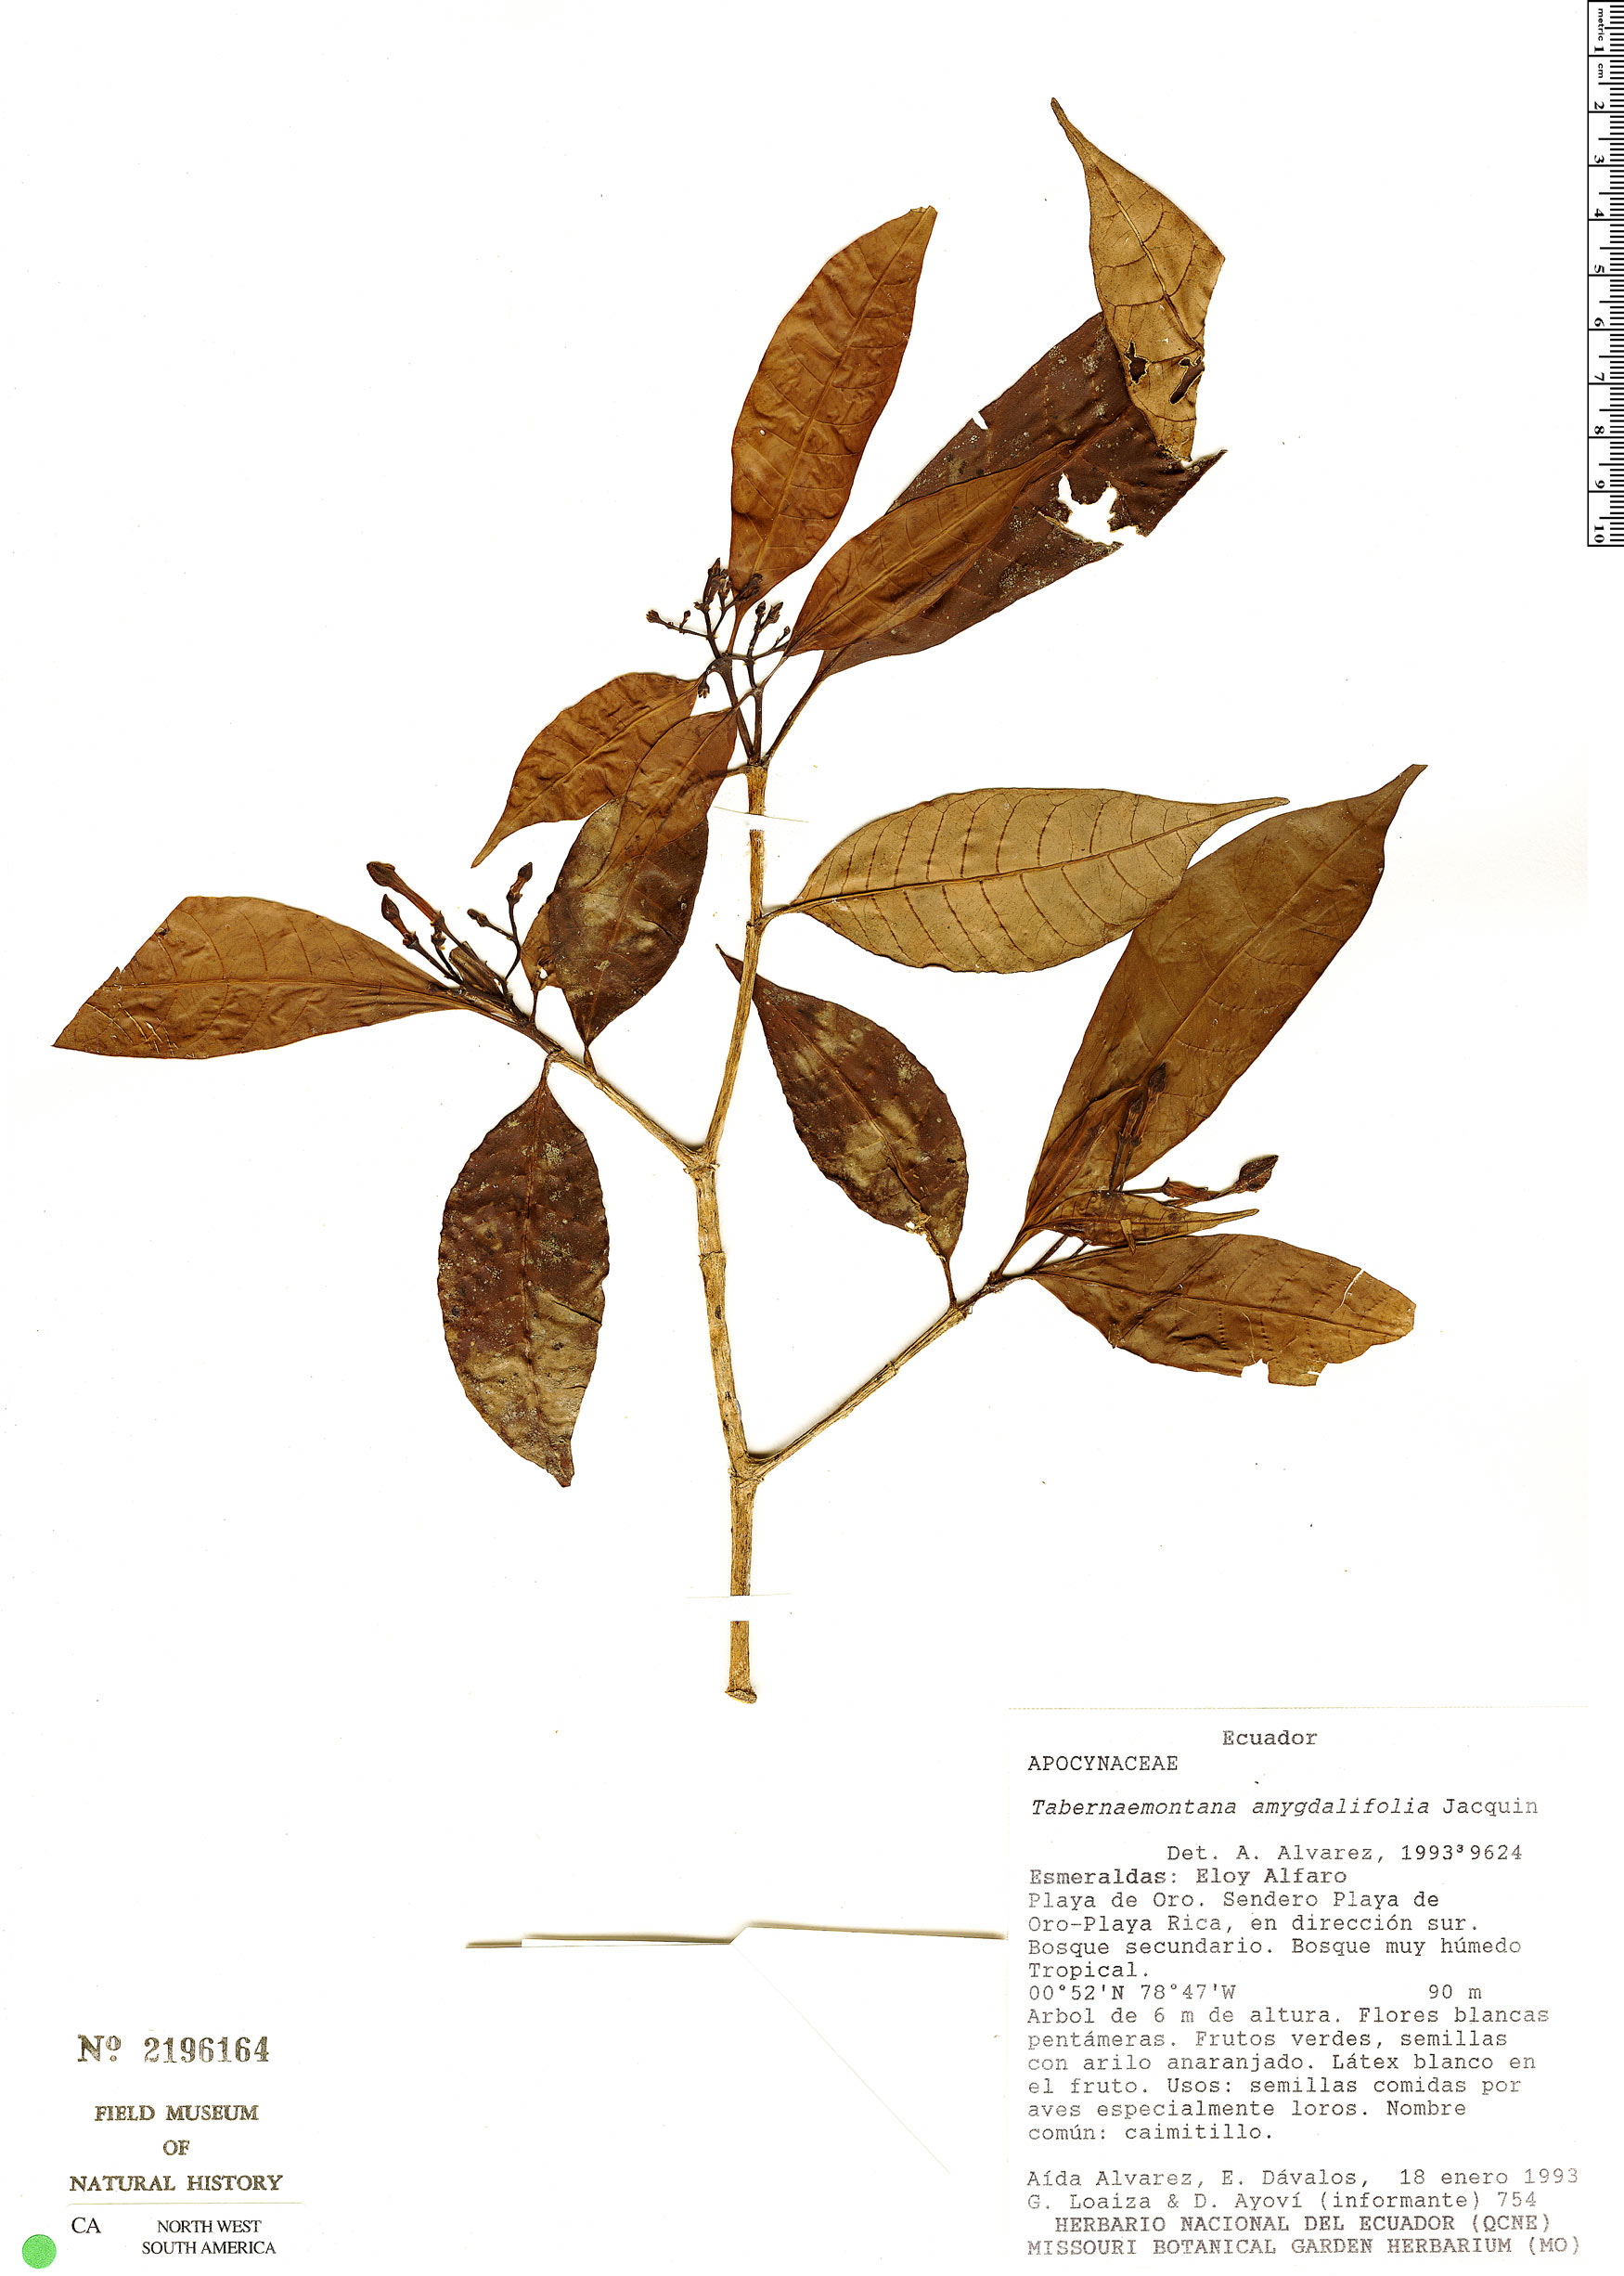 Specimen: Tabernaemontana amygdalifolia